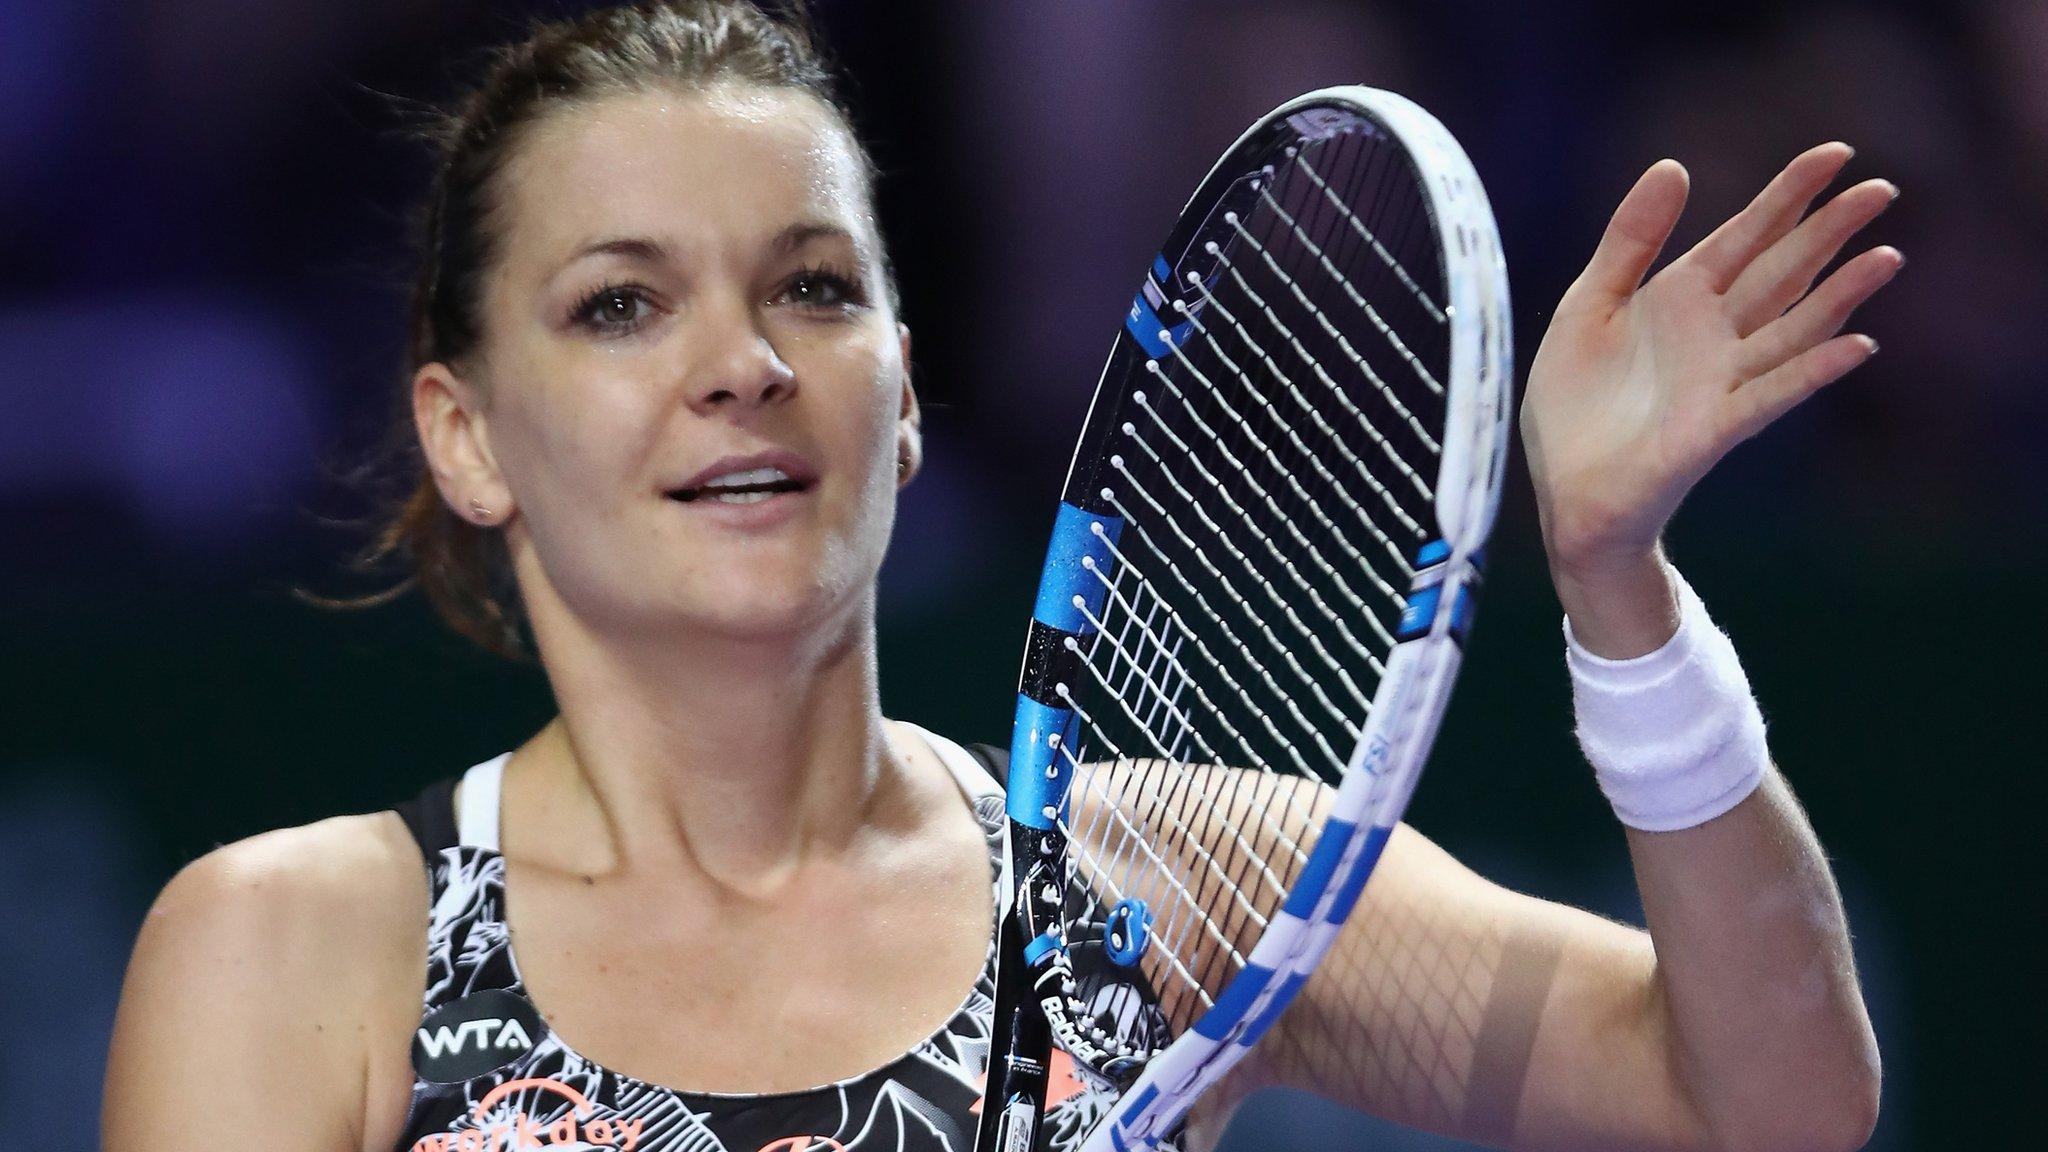 Agnieszka Radwanska to face Angelique Kerber in WTA semis